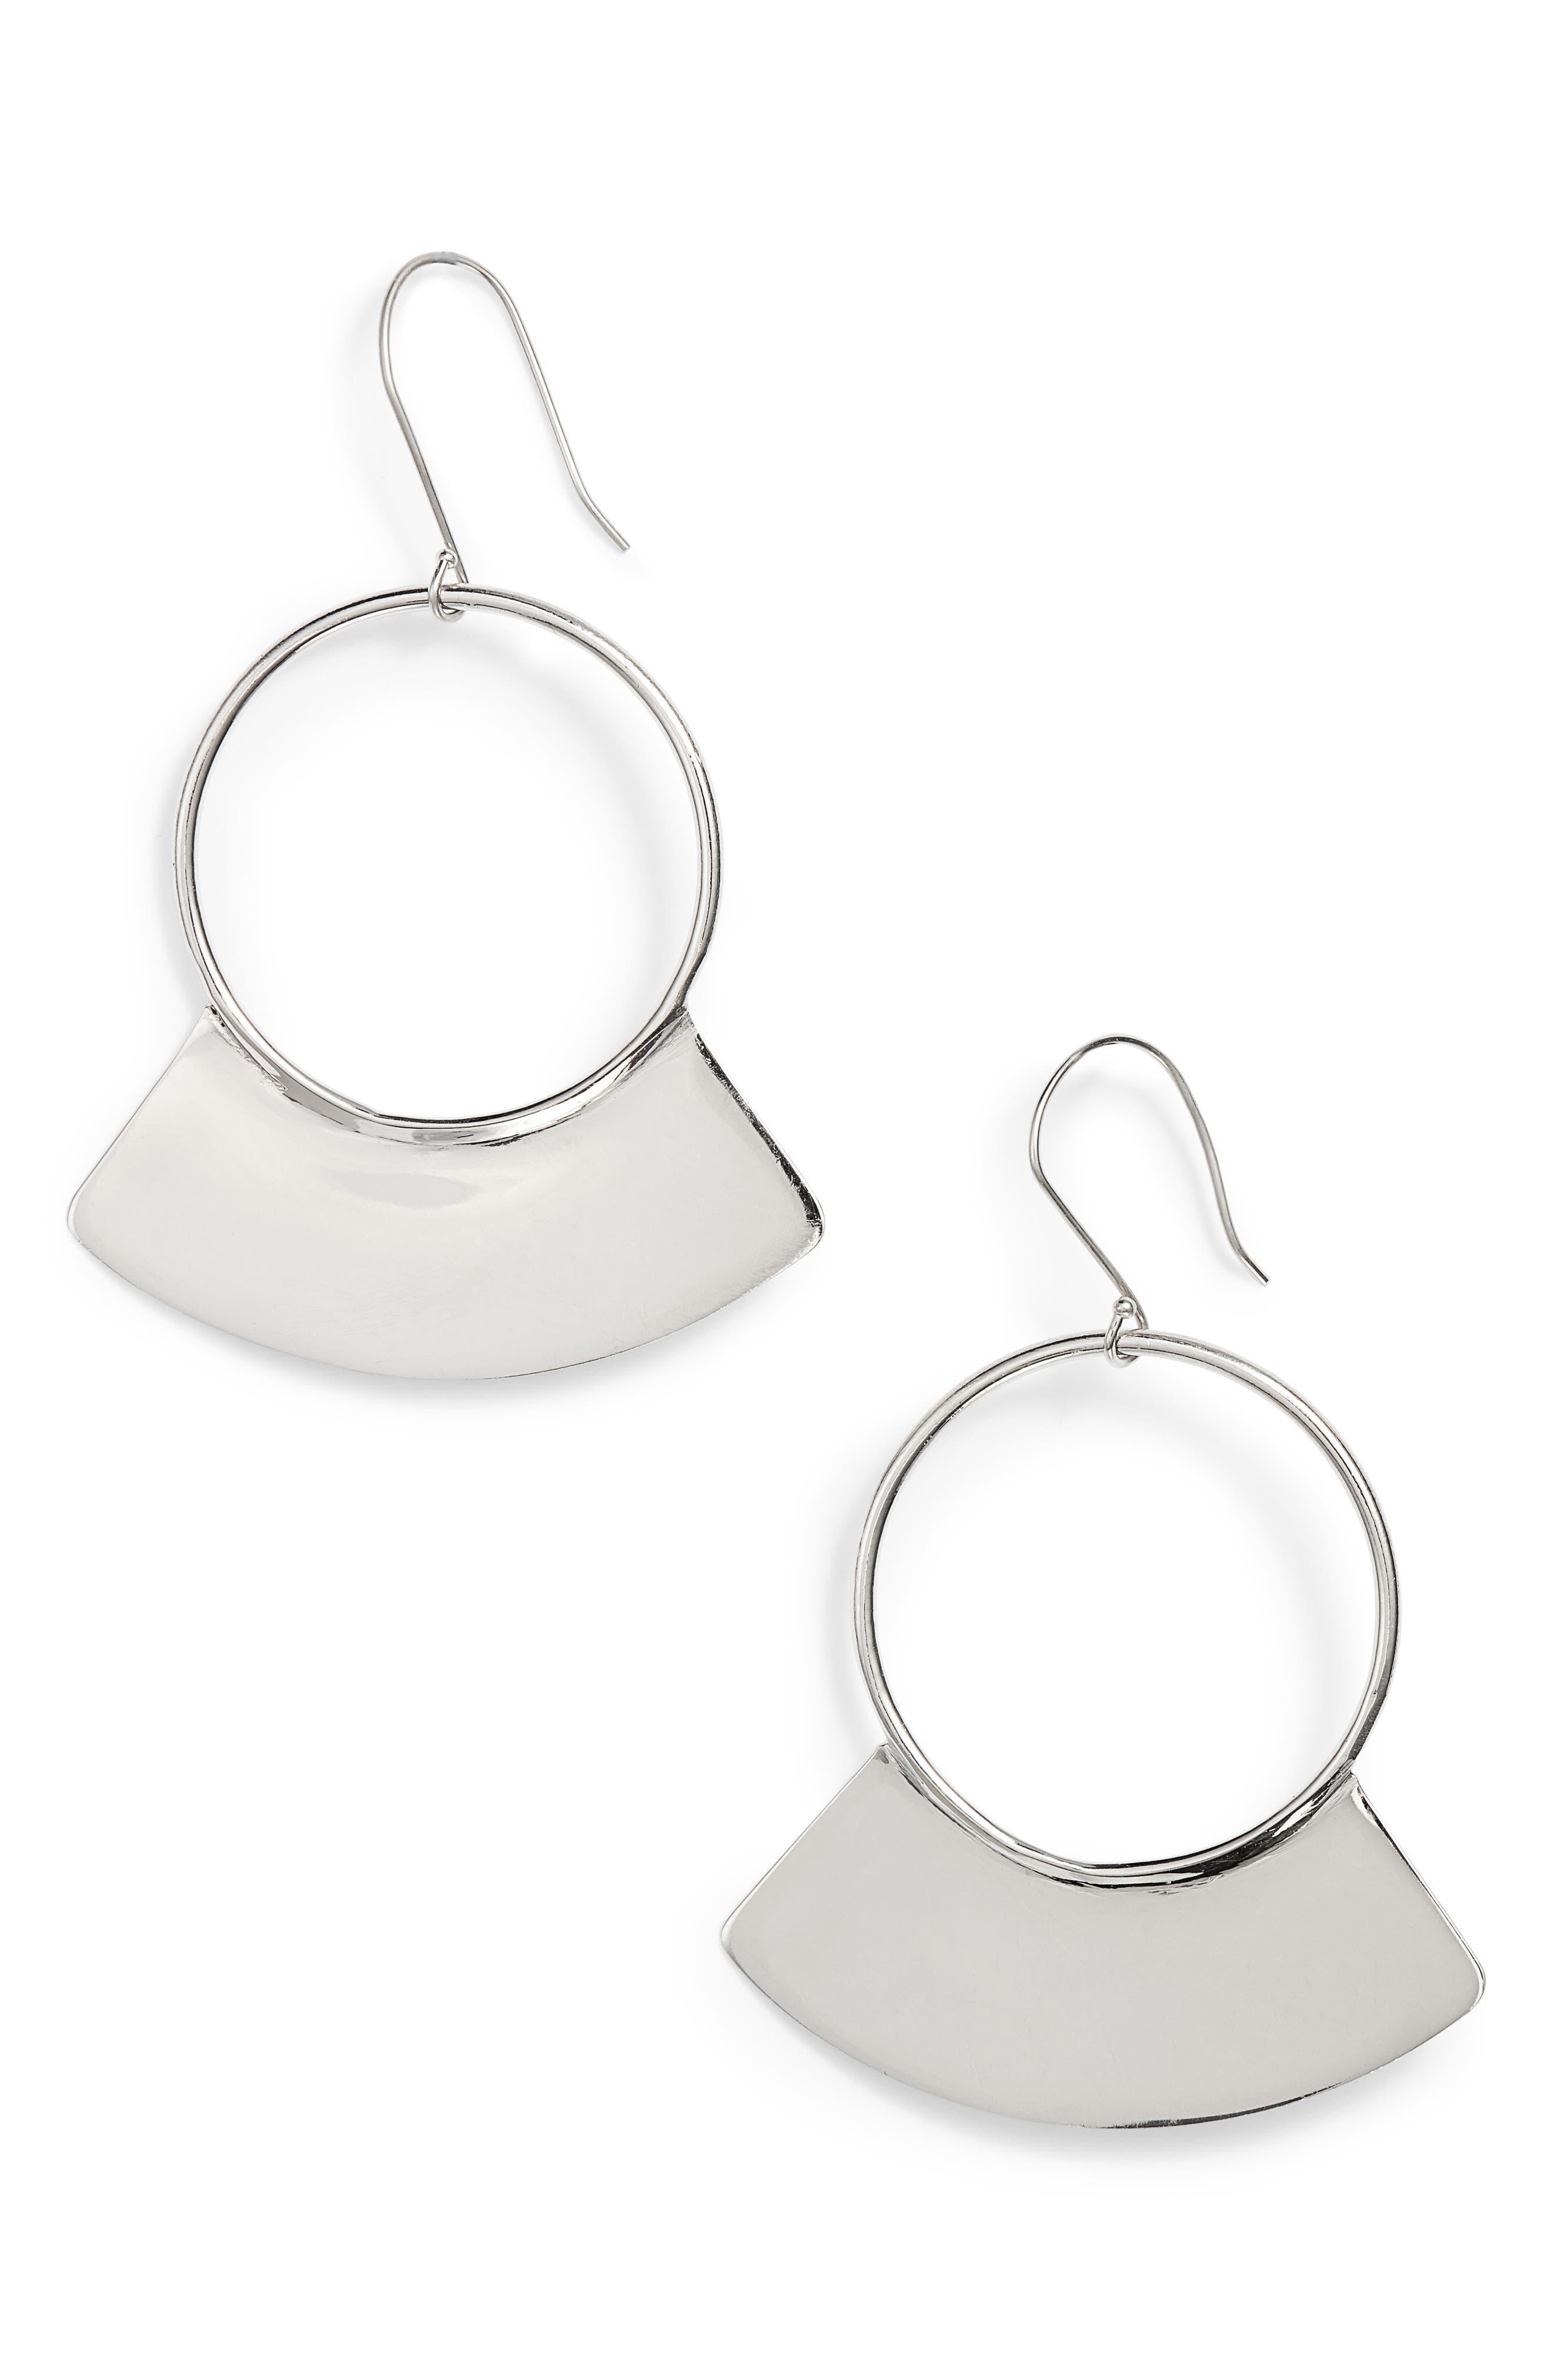 Alternate Image 1 Selected - Soko Paddle Earrings